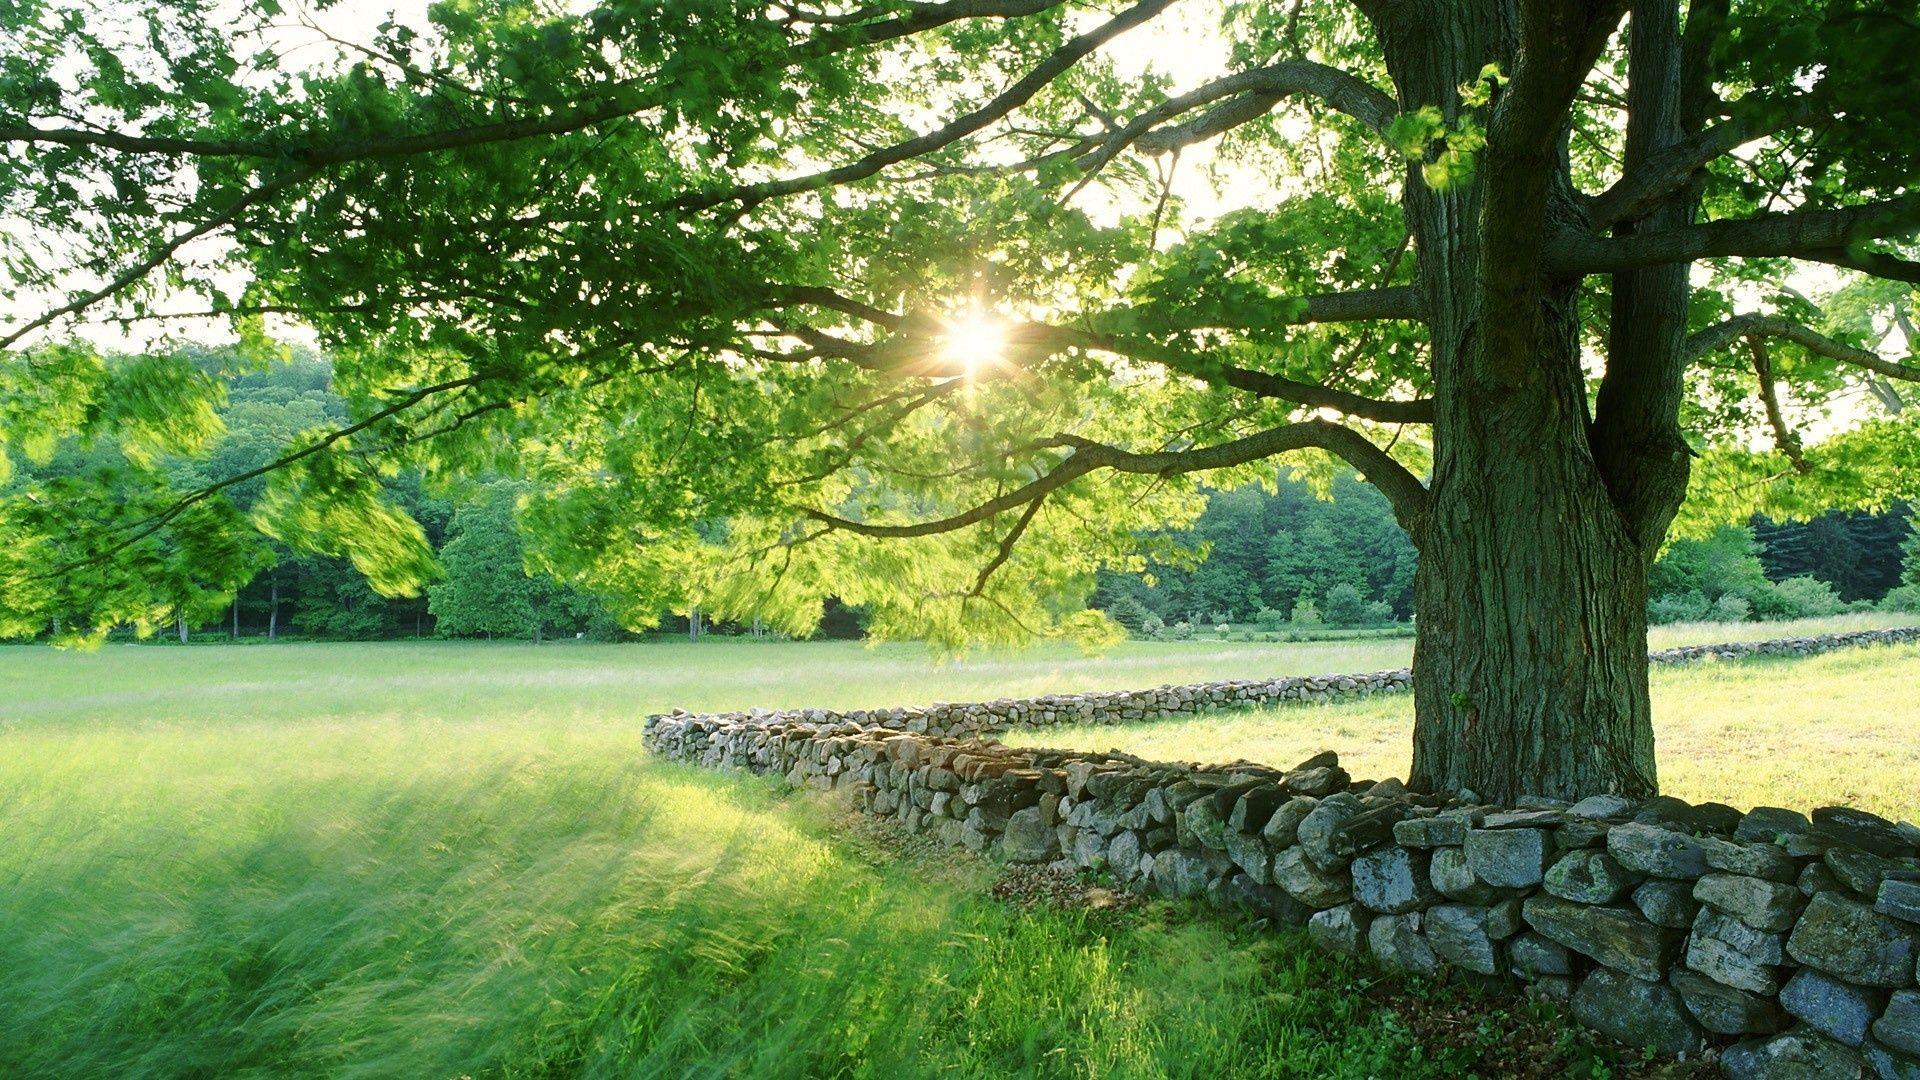 summer landscape image wallpaper - photo #40